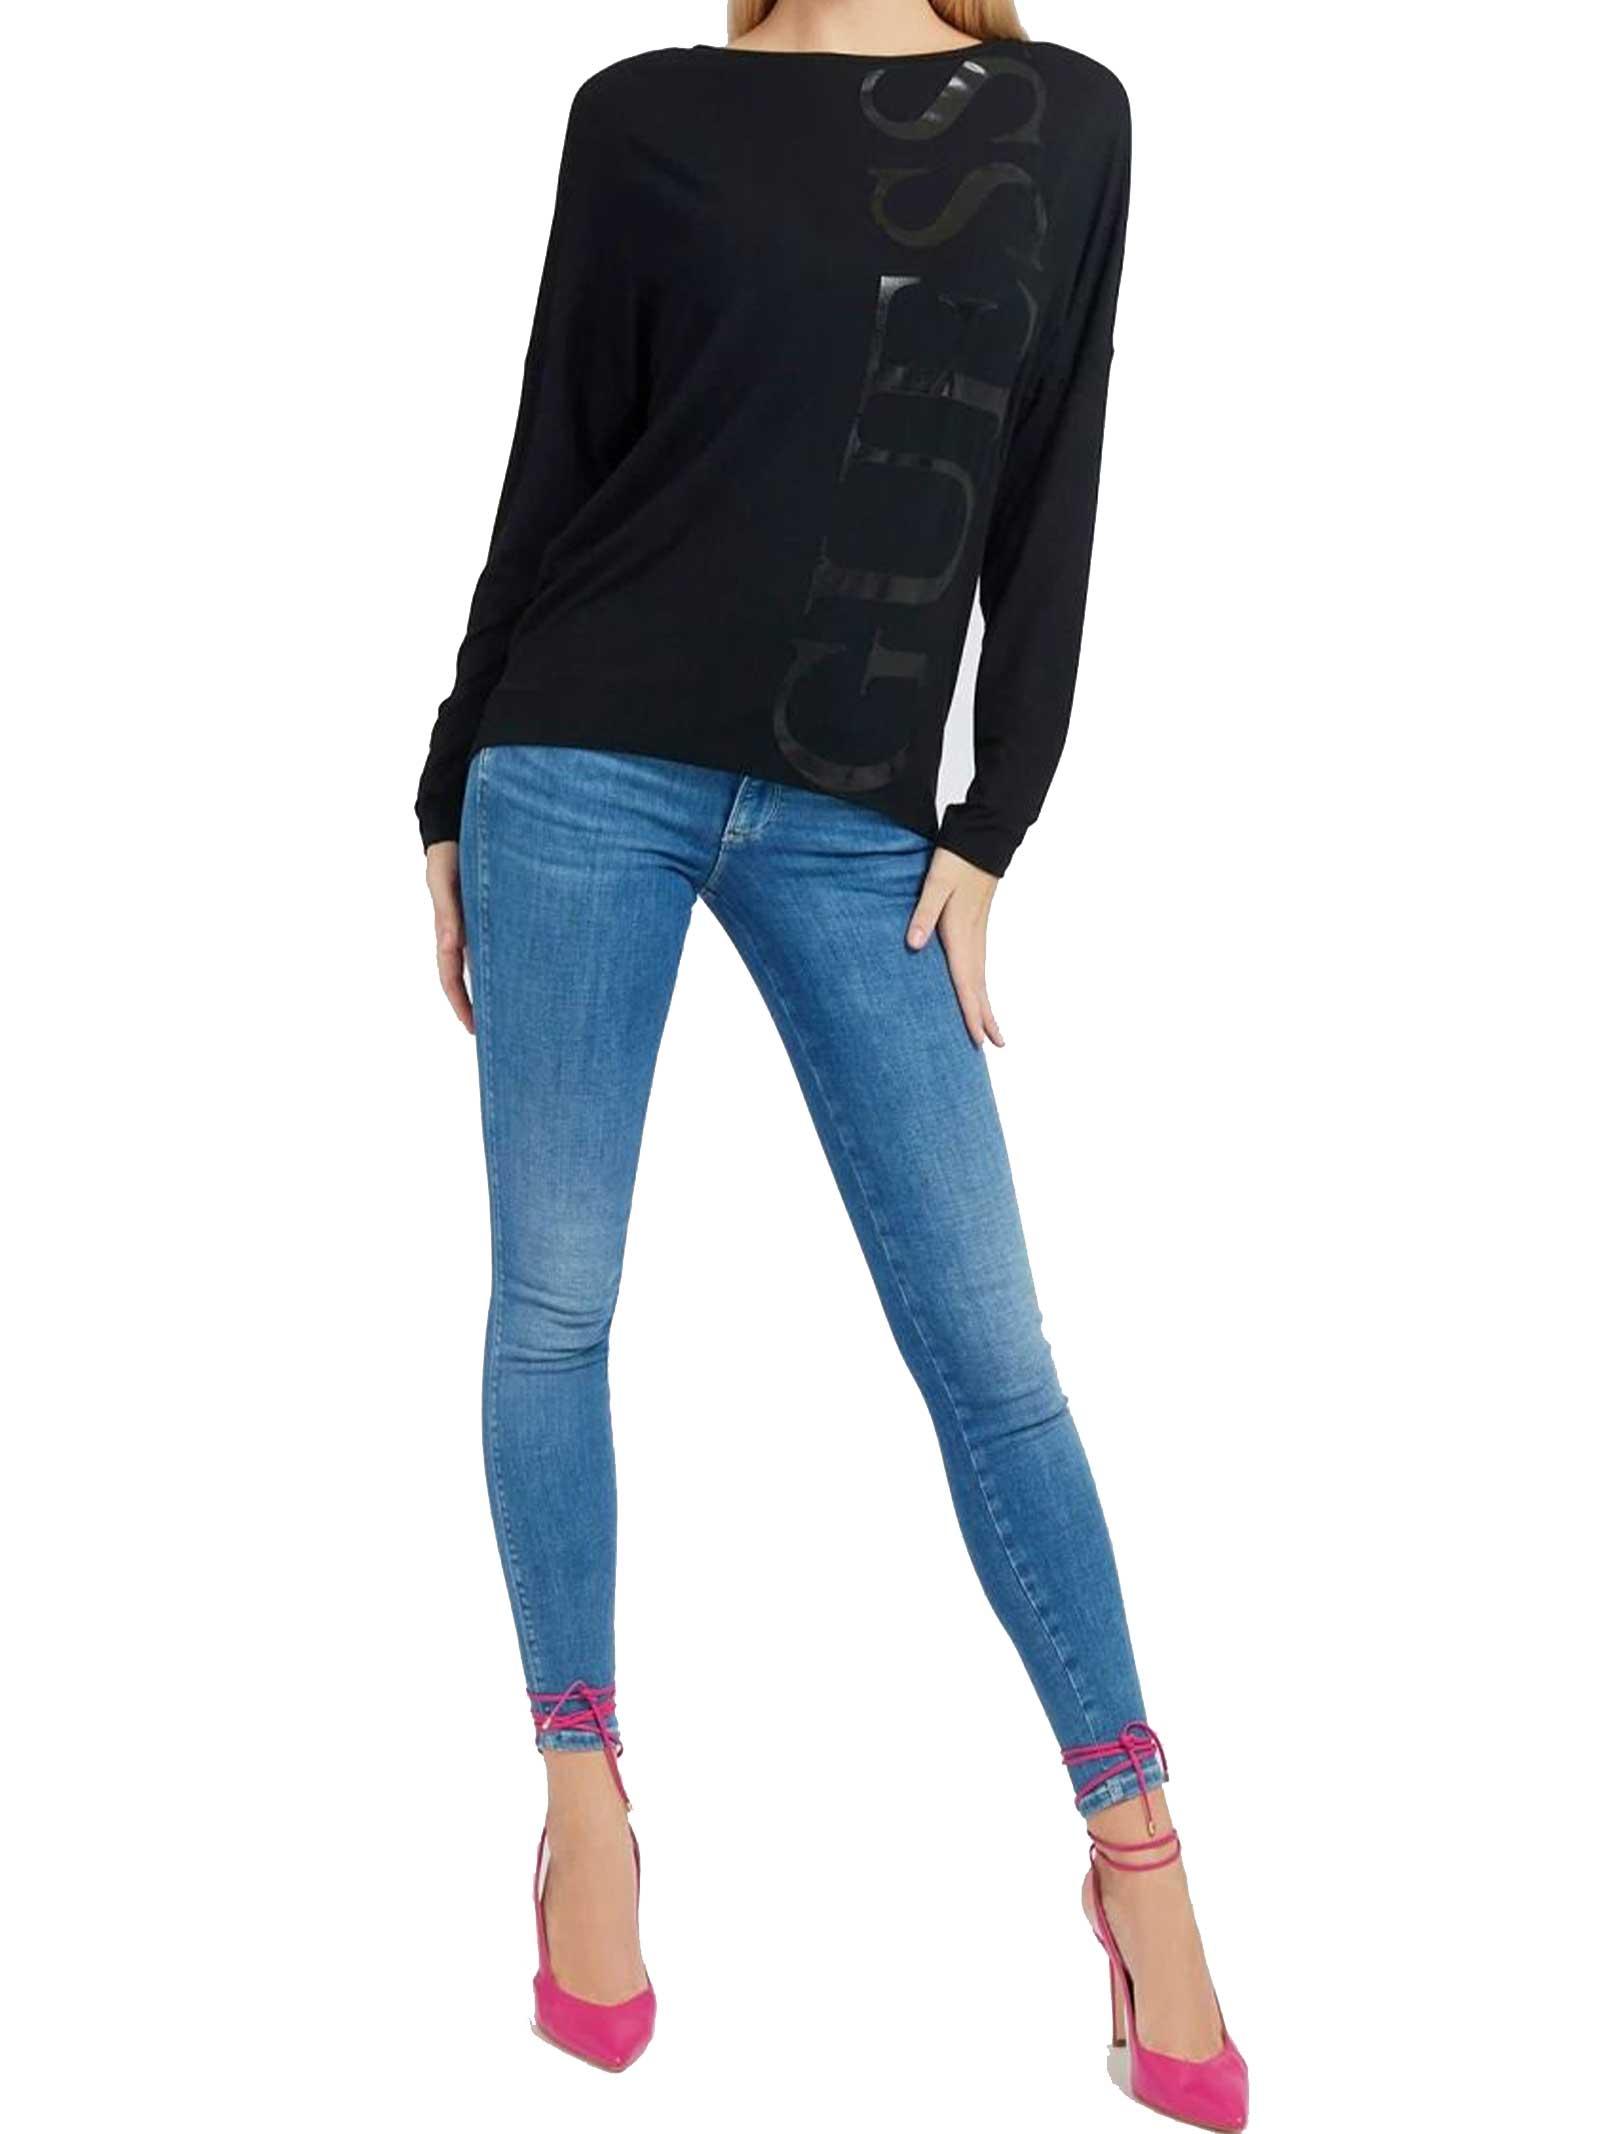 MAGLIA DONNA GUESS   T-shirt   W1RI0A-K68D0JBLK